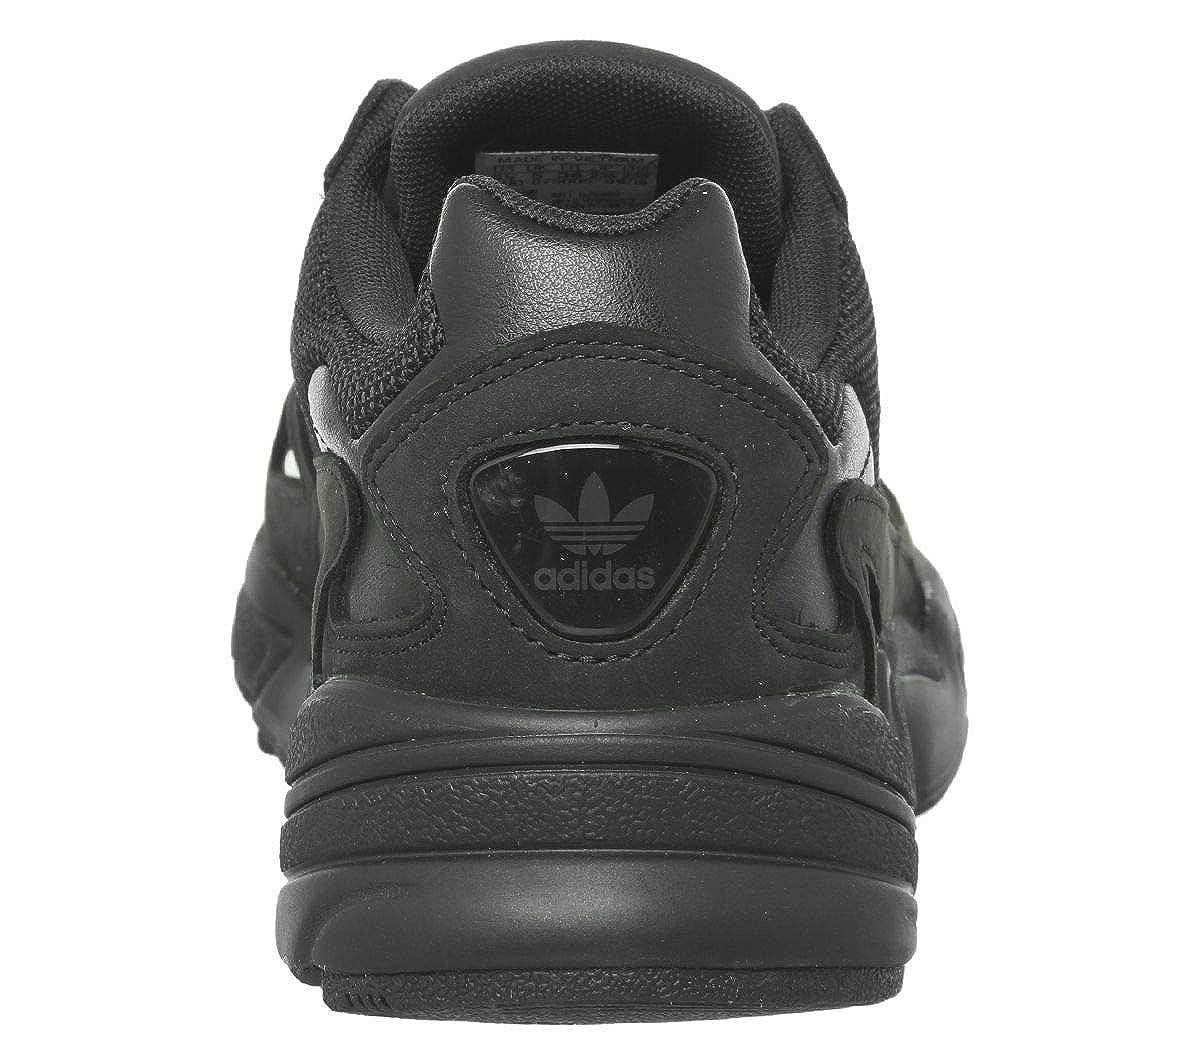 adidas Women's Falcon W Low Top Sneakers: Amazon.co.uk